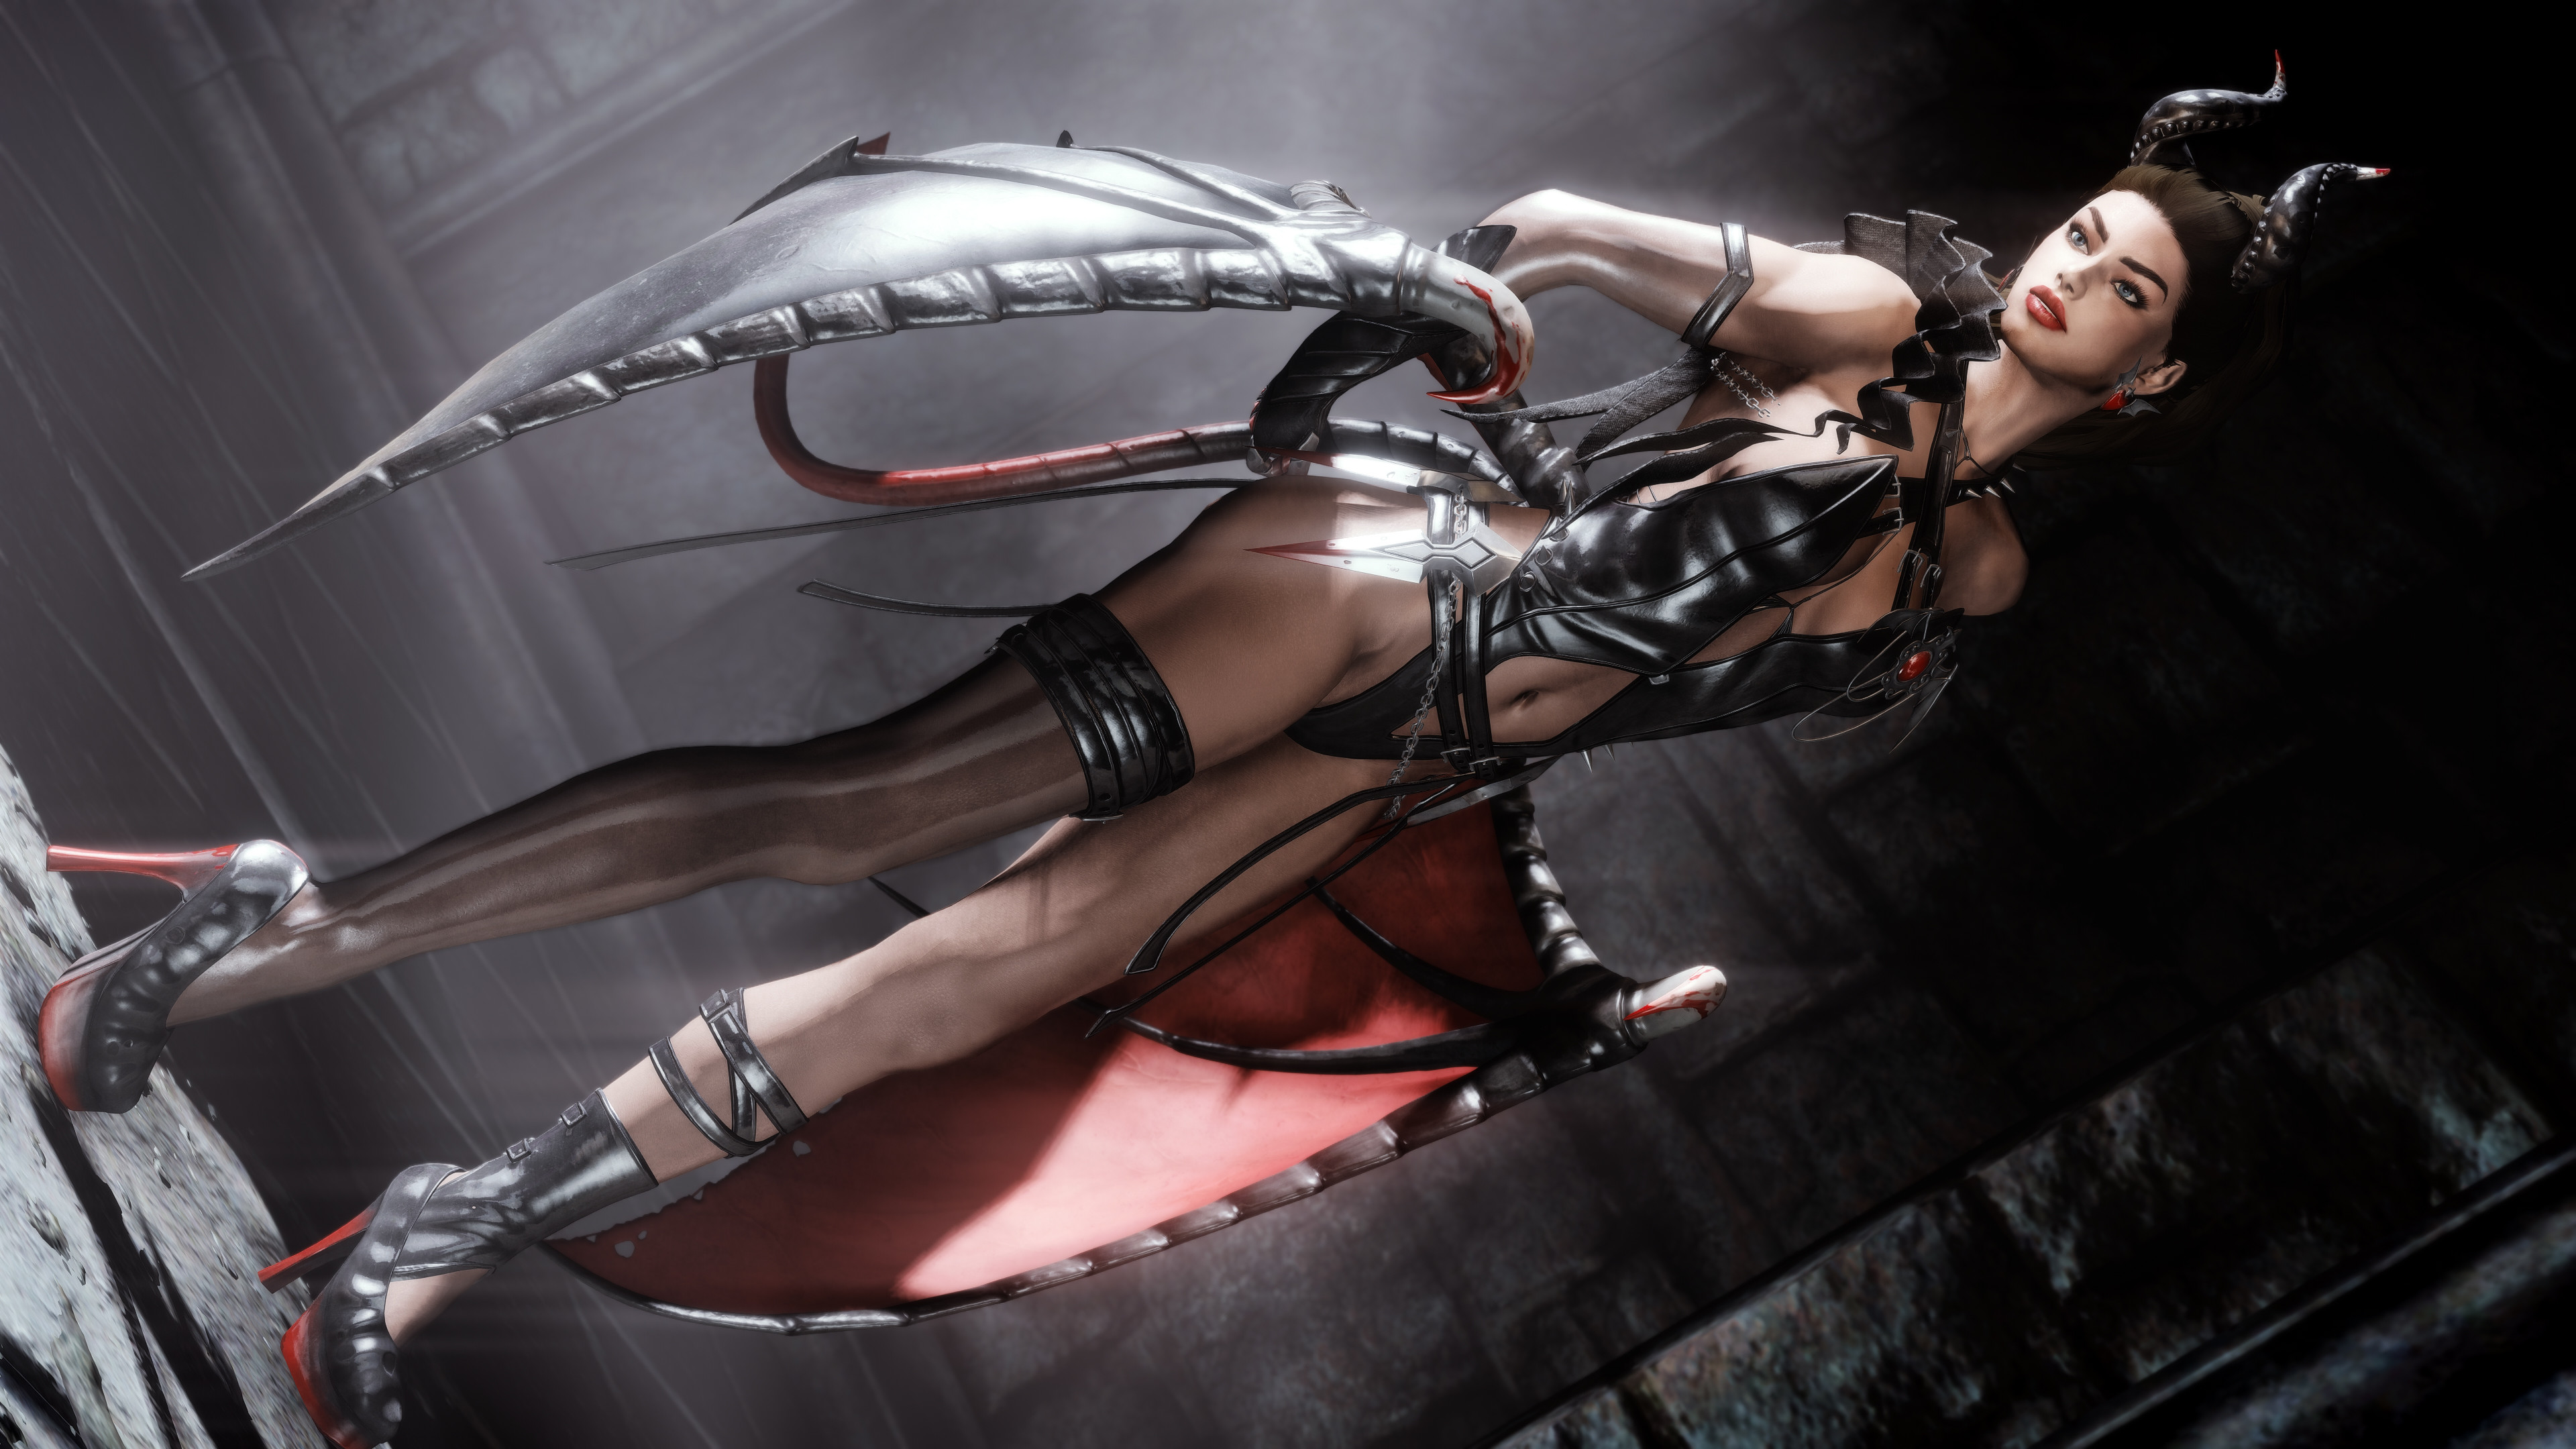 DX Succubus (Mazken) Armor